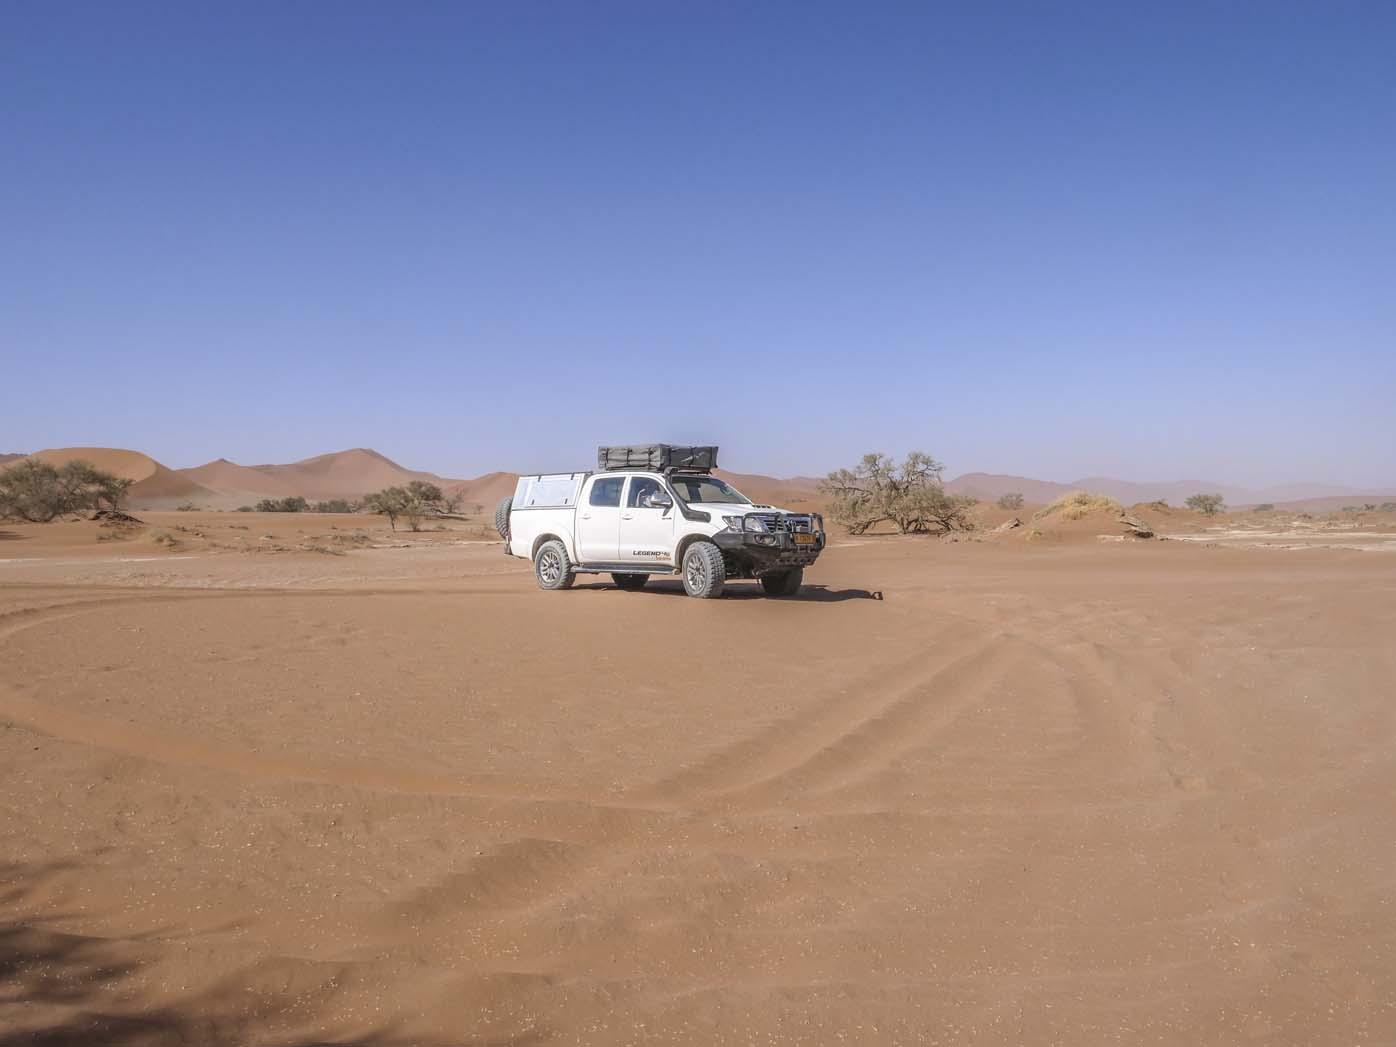 Namib desert boundaries in dating 7